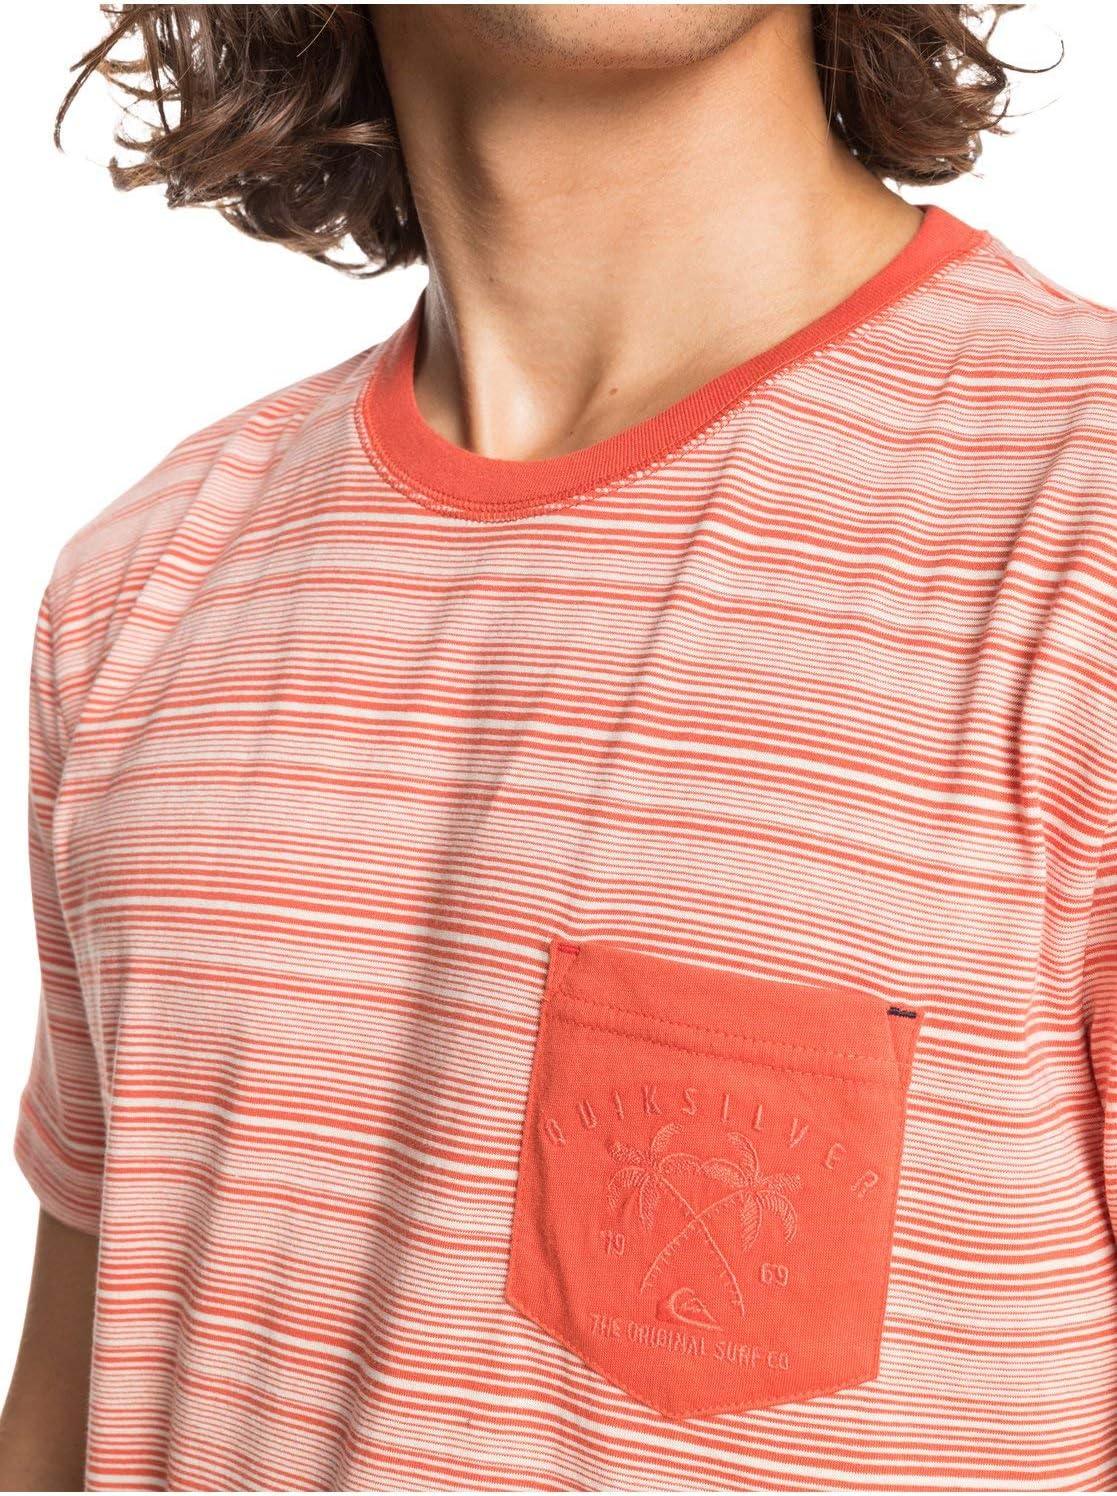 Quiksilver Pavillon Surf Camiseta para Hombre